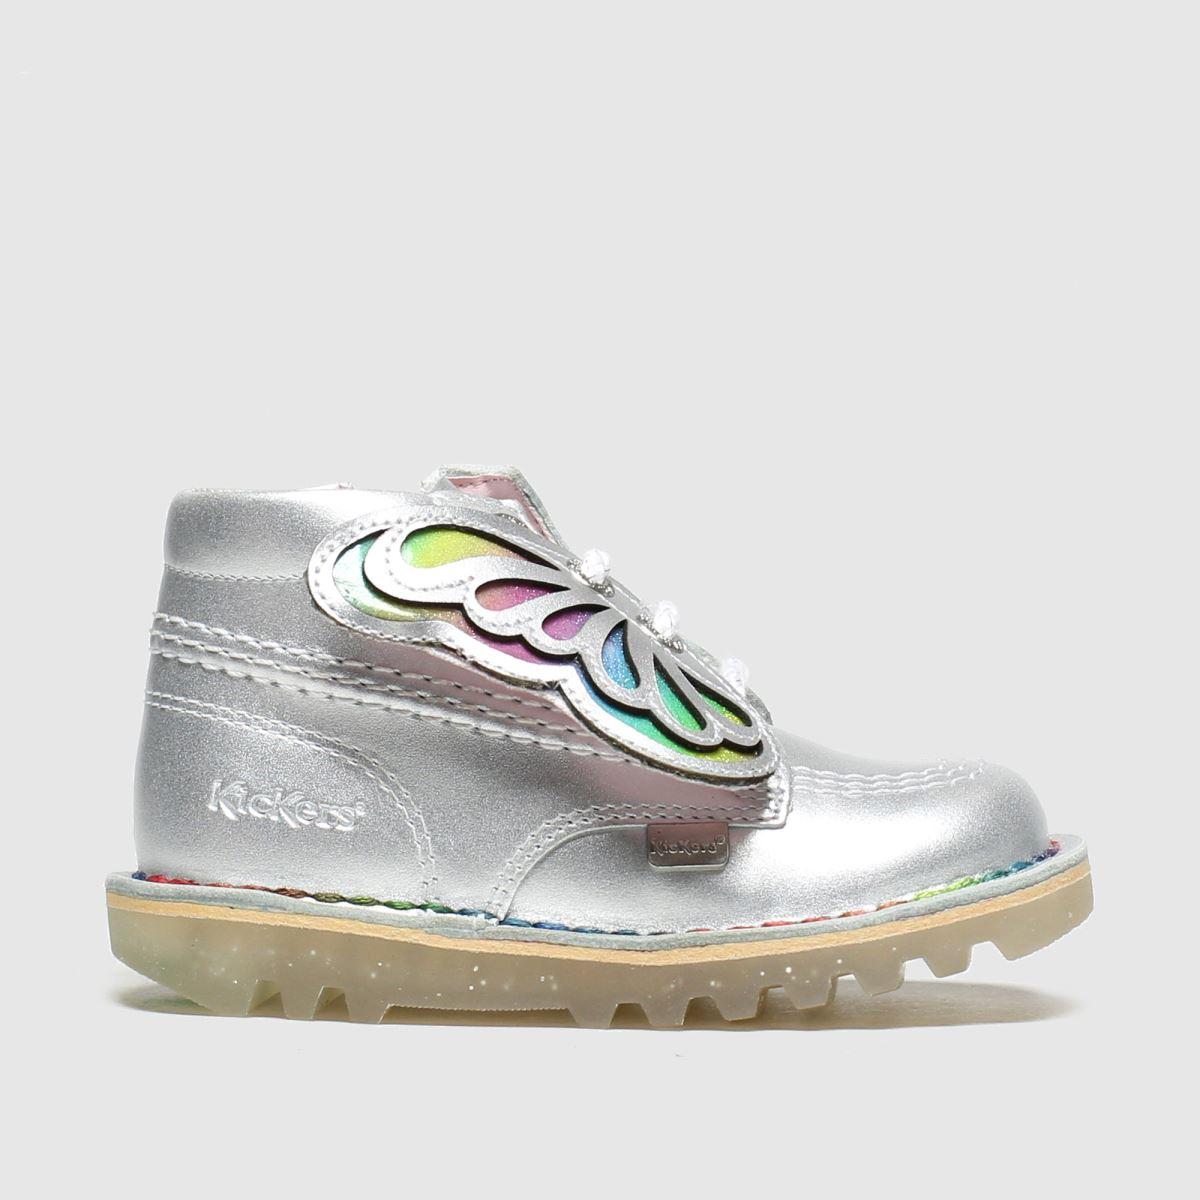 Kickers Silver Kick Hi Faeries Boots Toddler